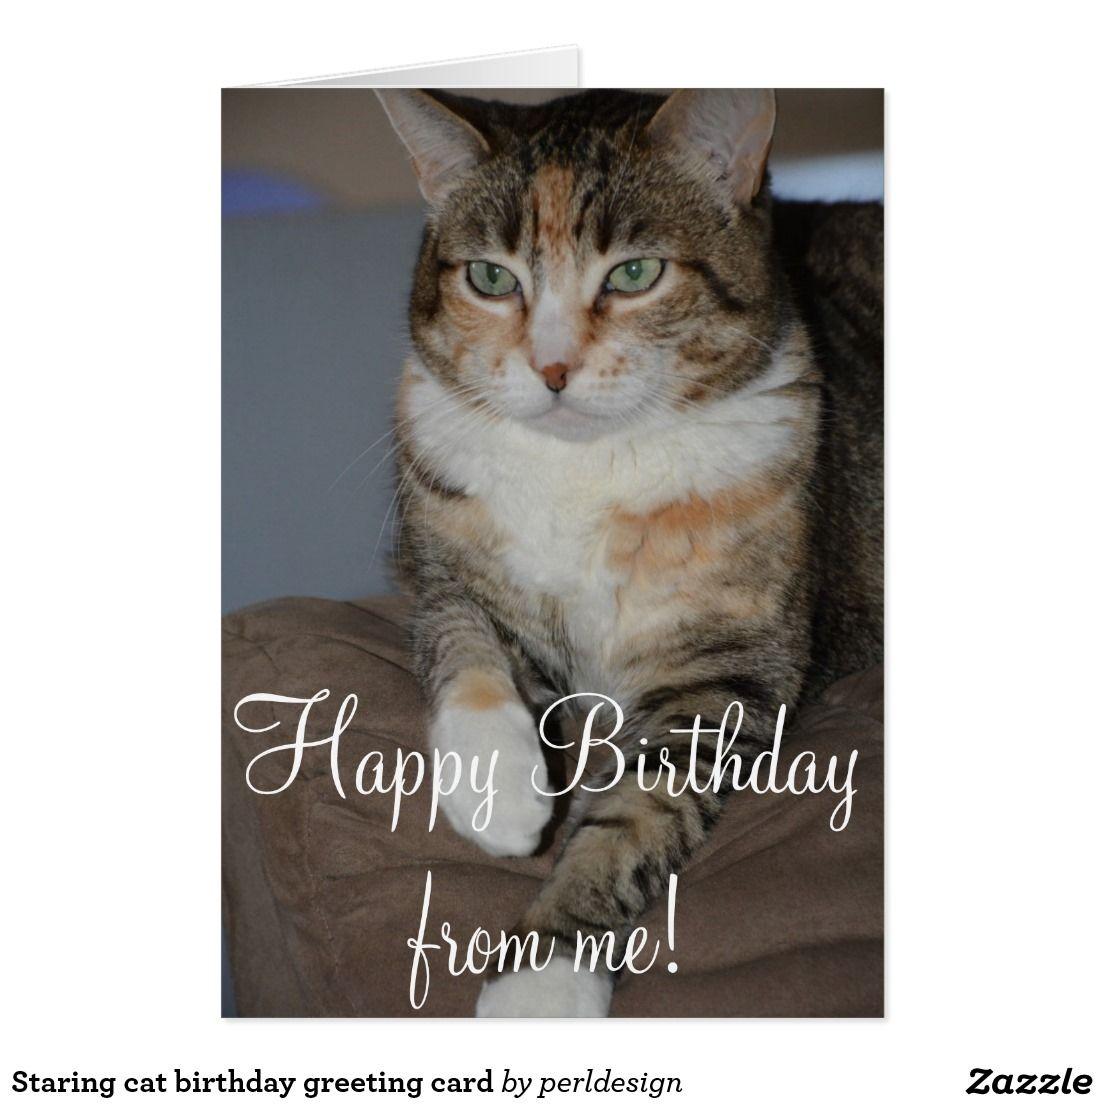 Staring cat birthday greeting card beautiful animals pinterest staring cat birthday greeting card kristyandbryce Gallery